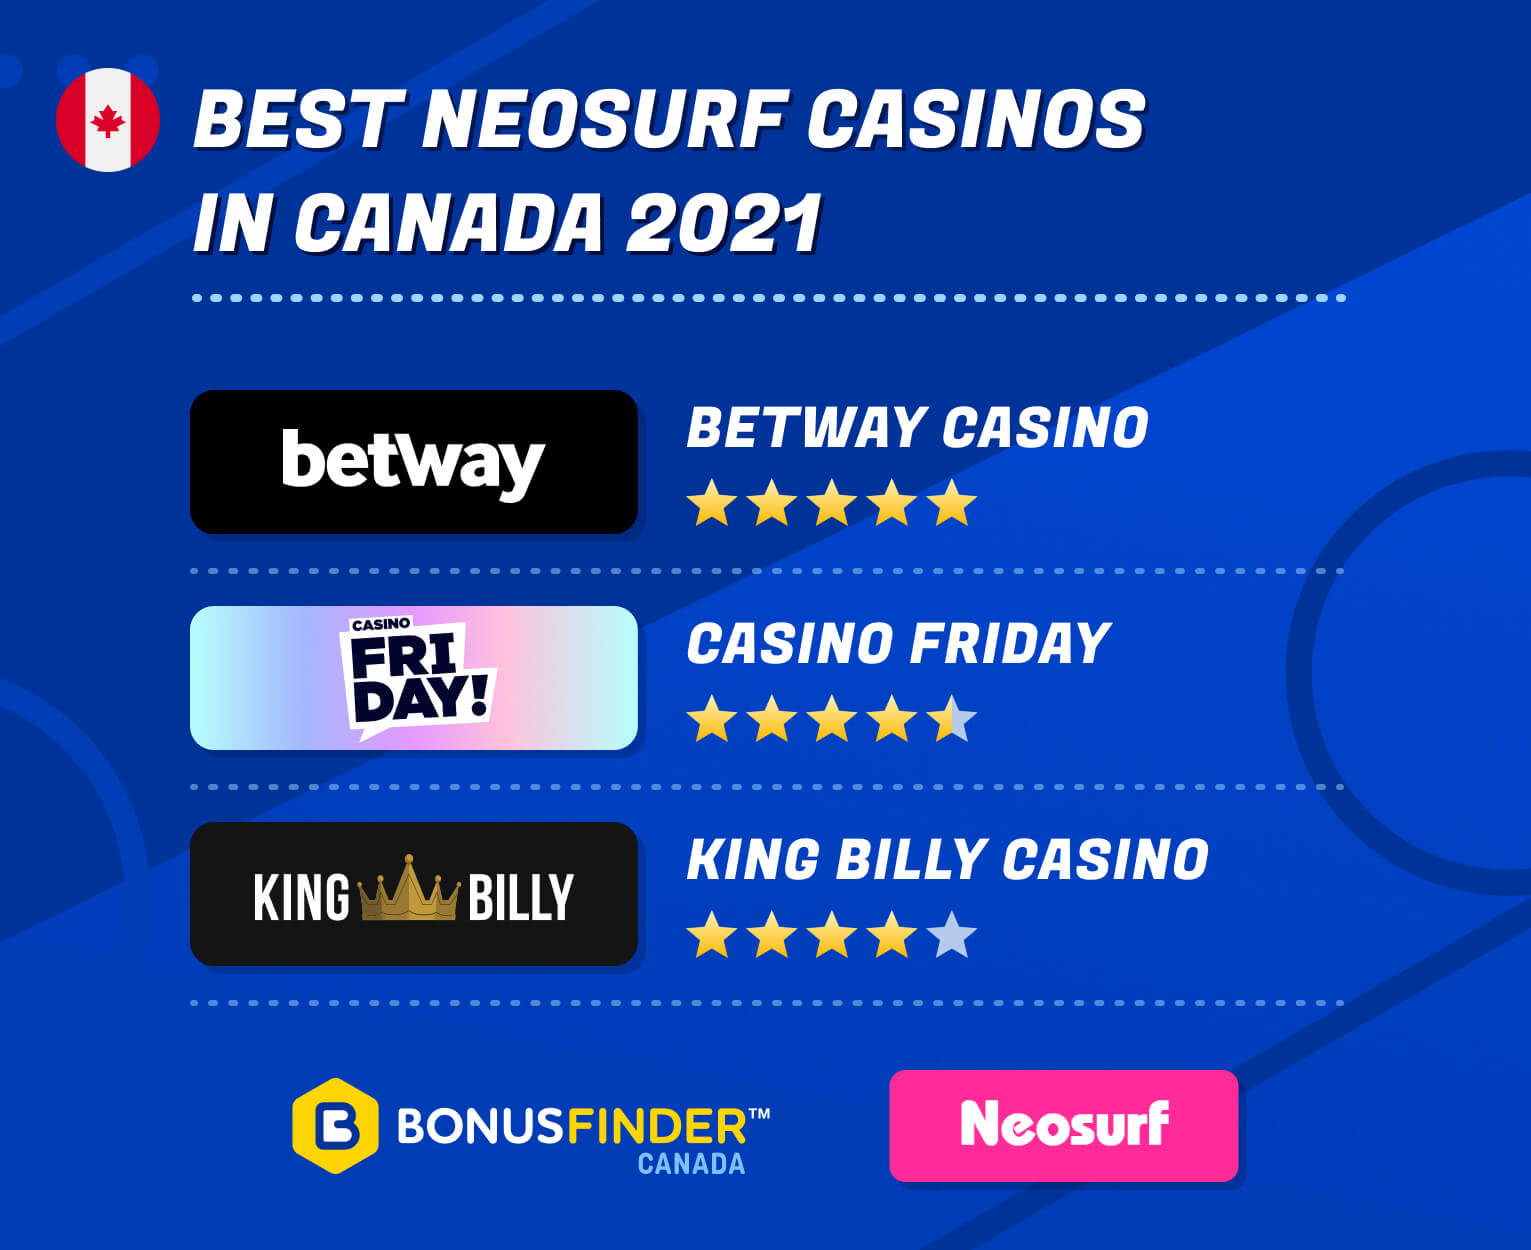 NeoSurf Casinos Canada